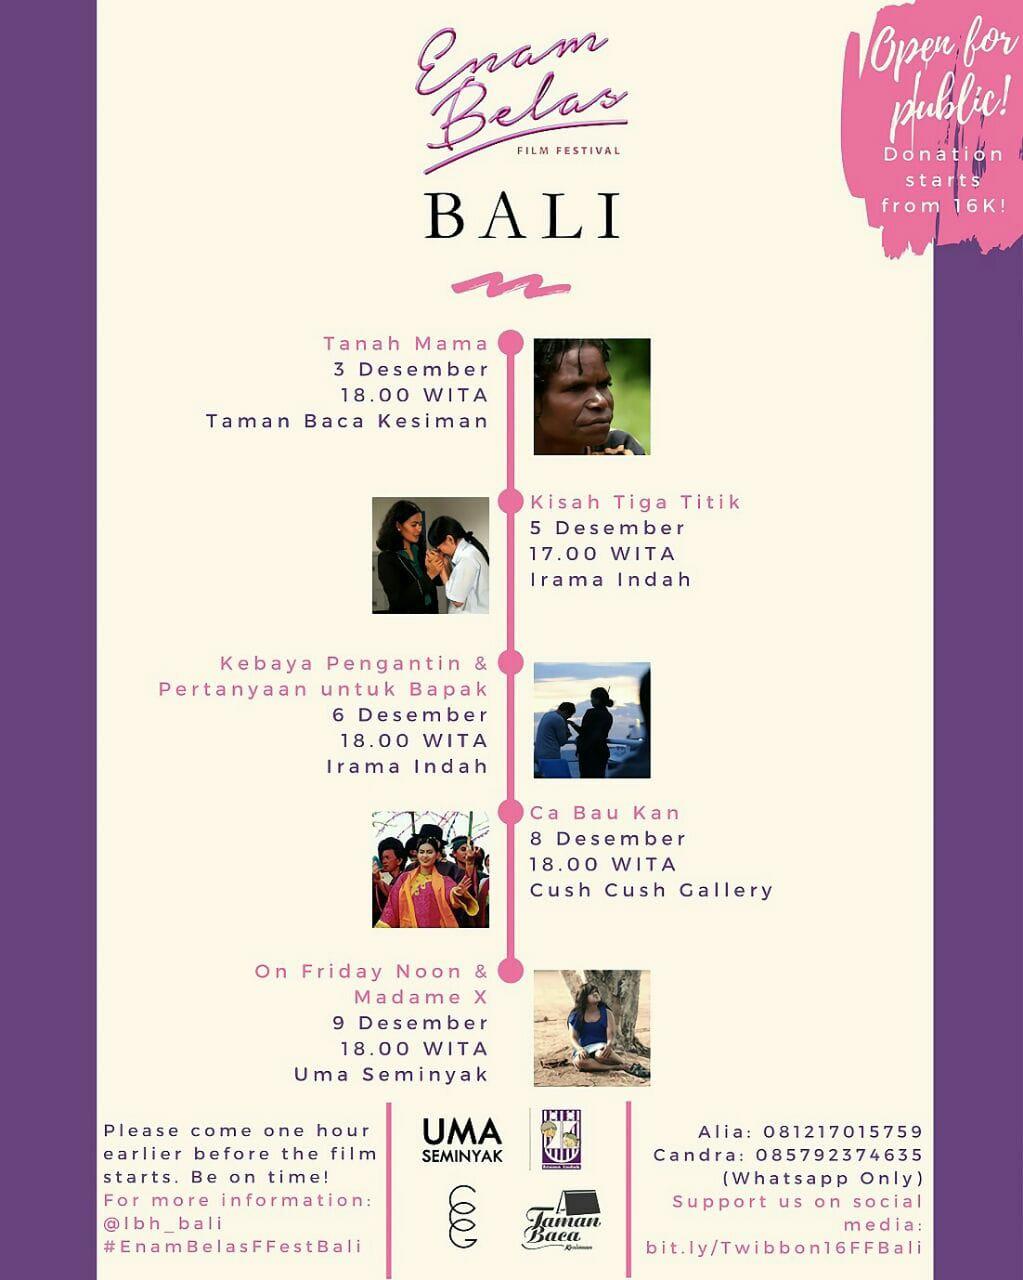 Enambelas Film Festival bersama LBH Bali 2017